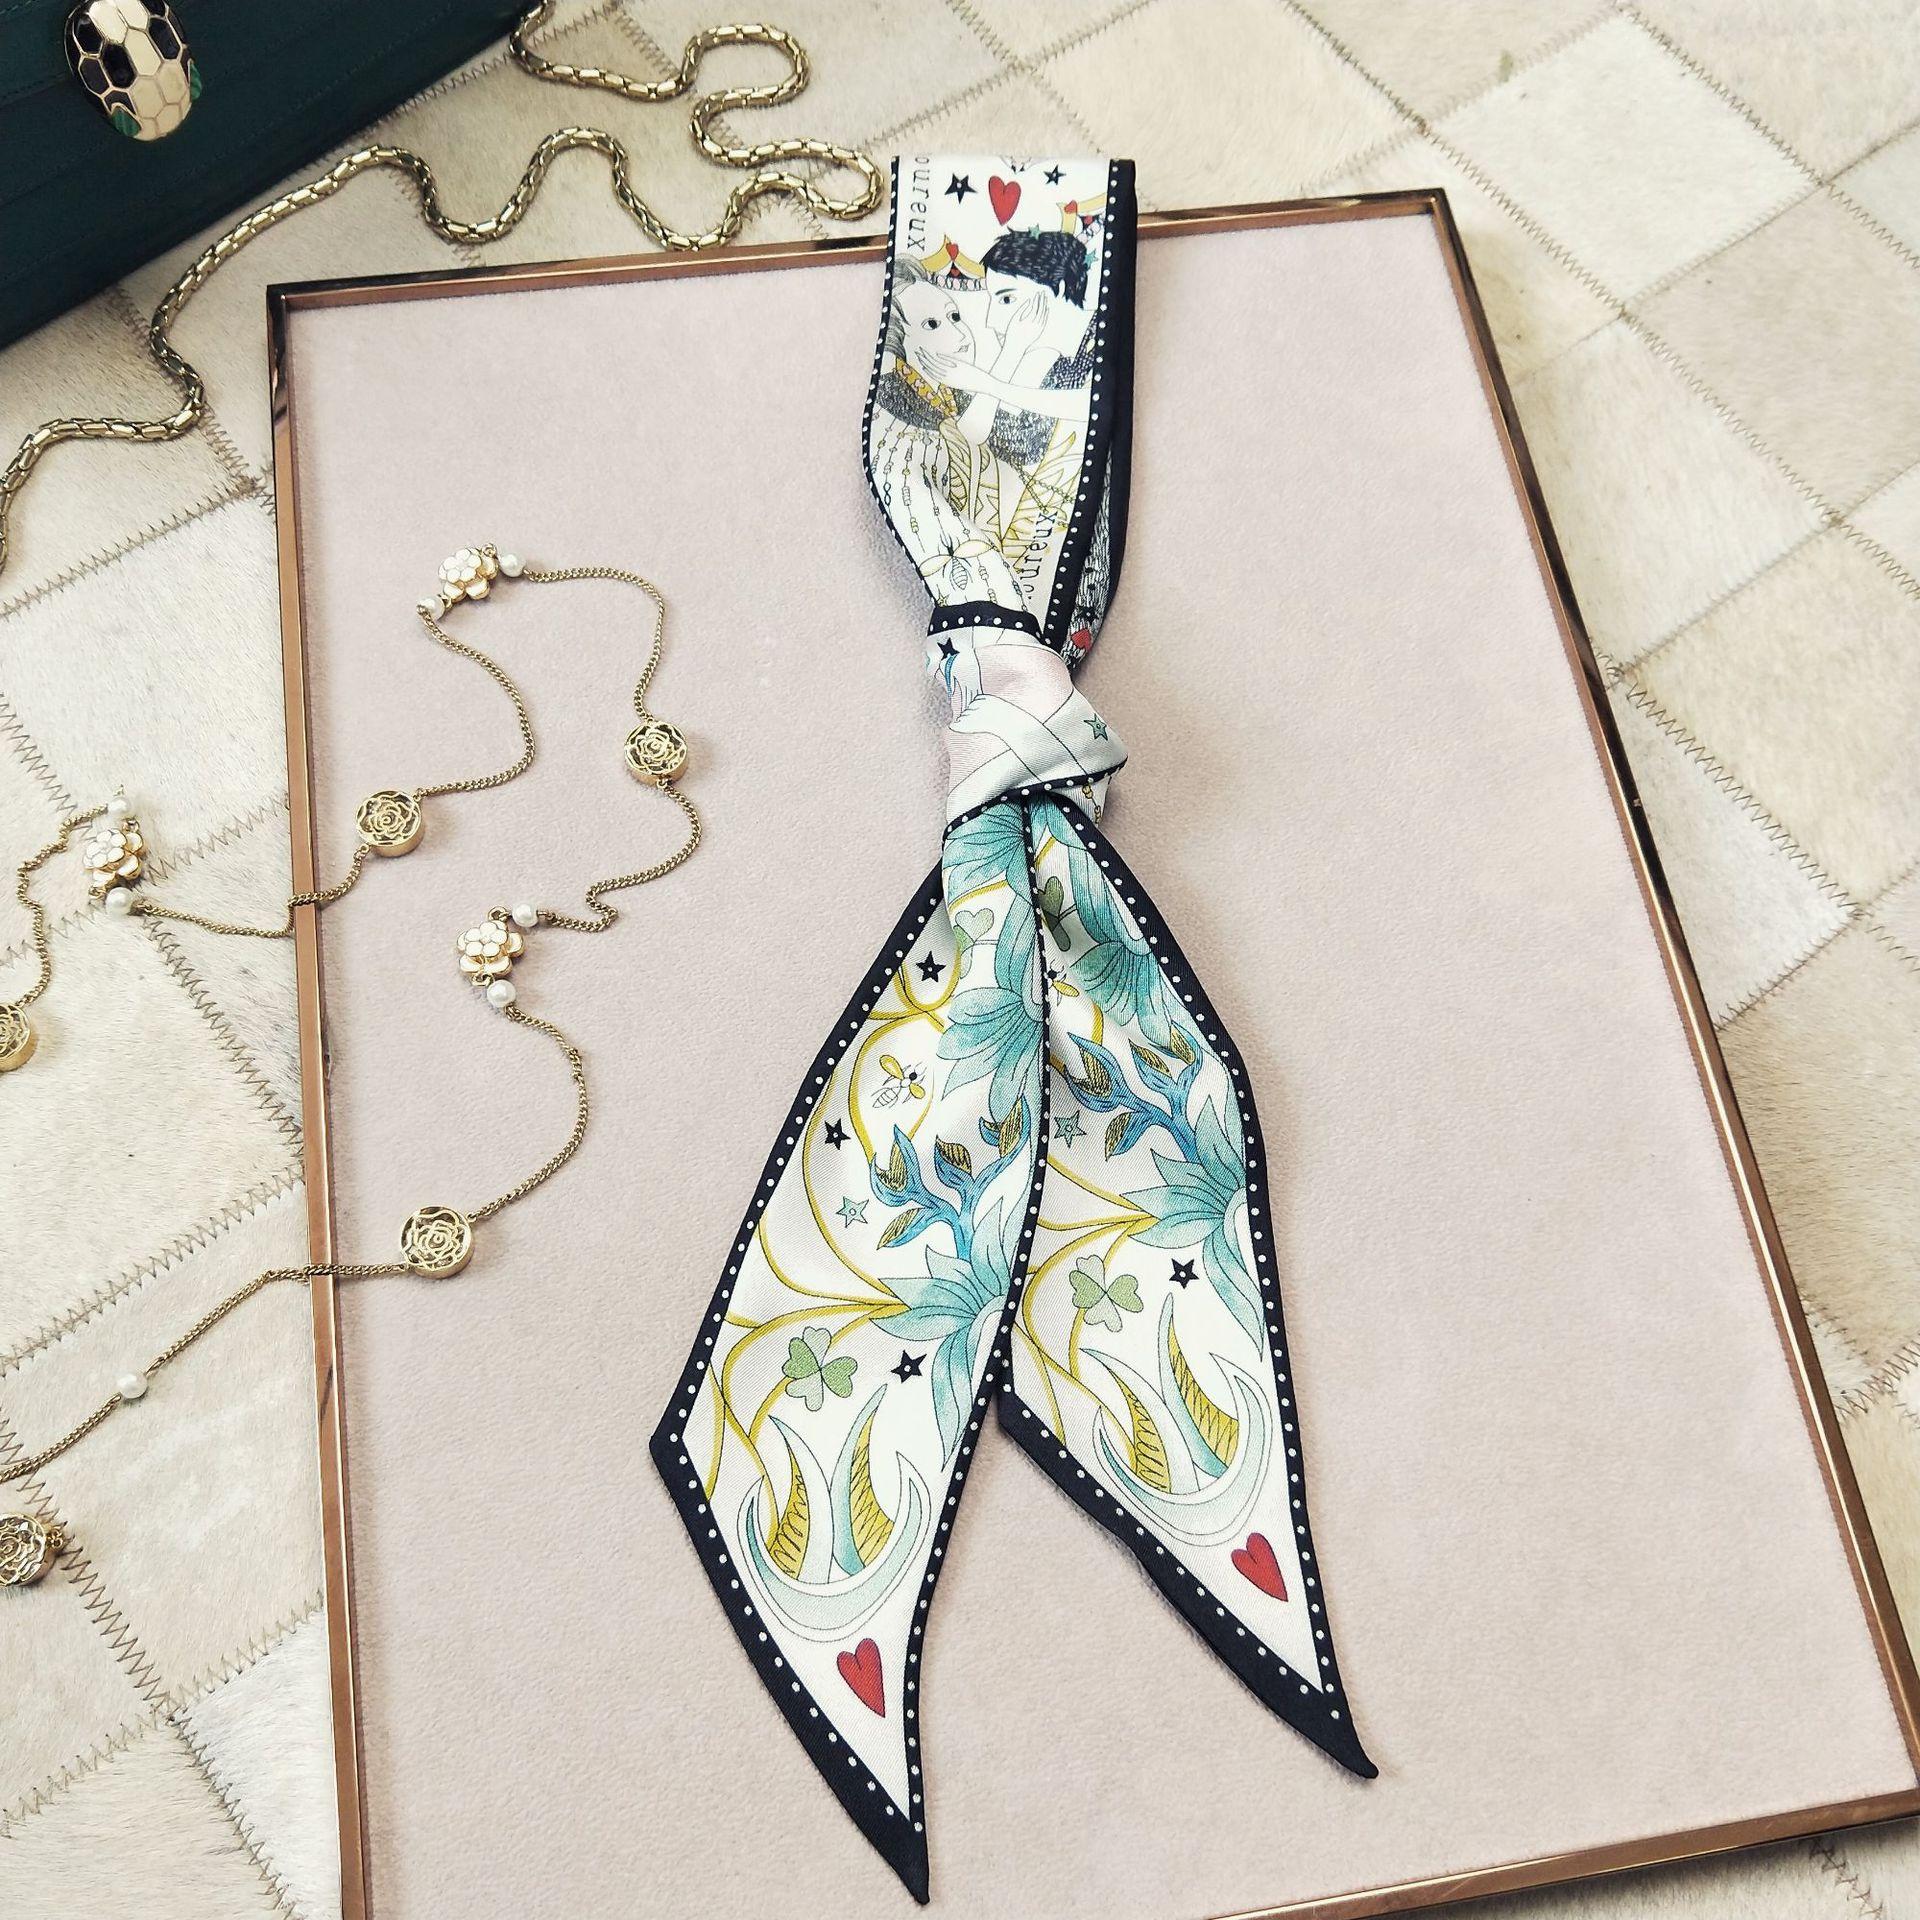 Hot Sale Small Square Satin Hair Scarf Women Silk Scarfs Foulard Bandana Elegant Ladies Wrap Handkerchief Accessories 2020 New